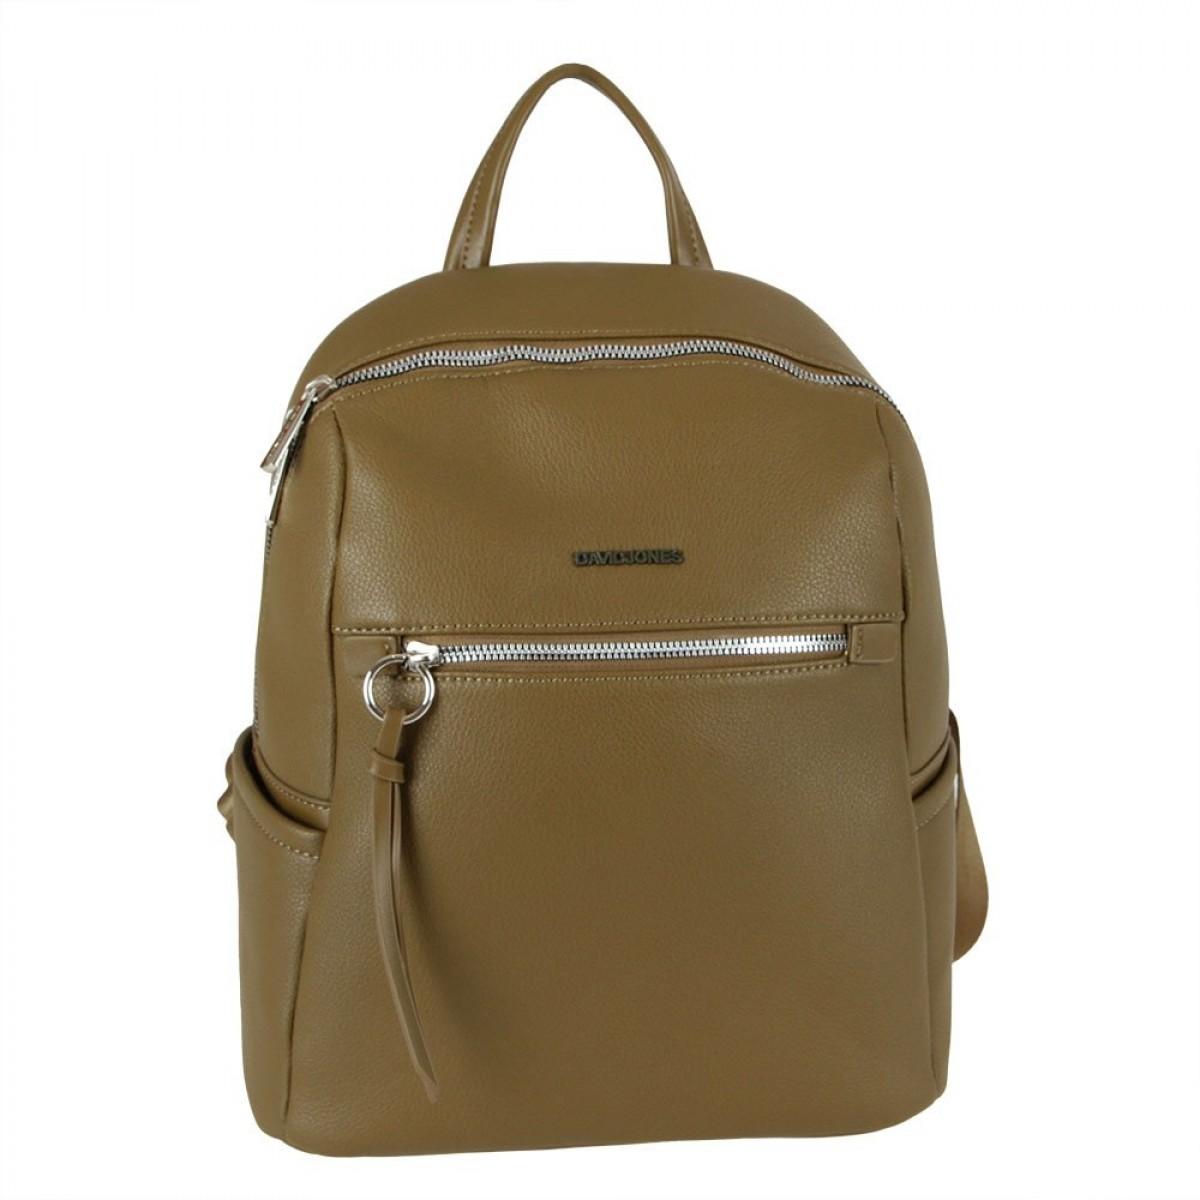 Жіночий рюкзак David Jones 6422-2 VERT